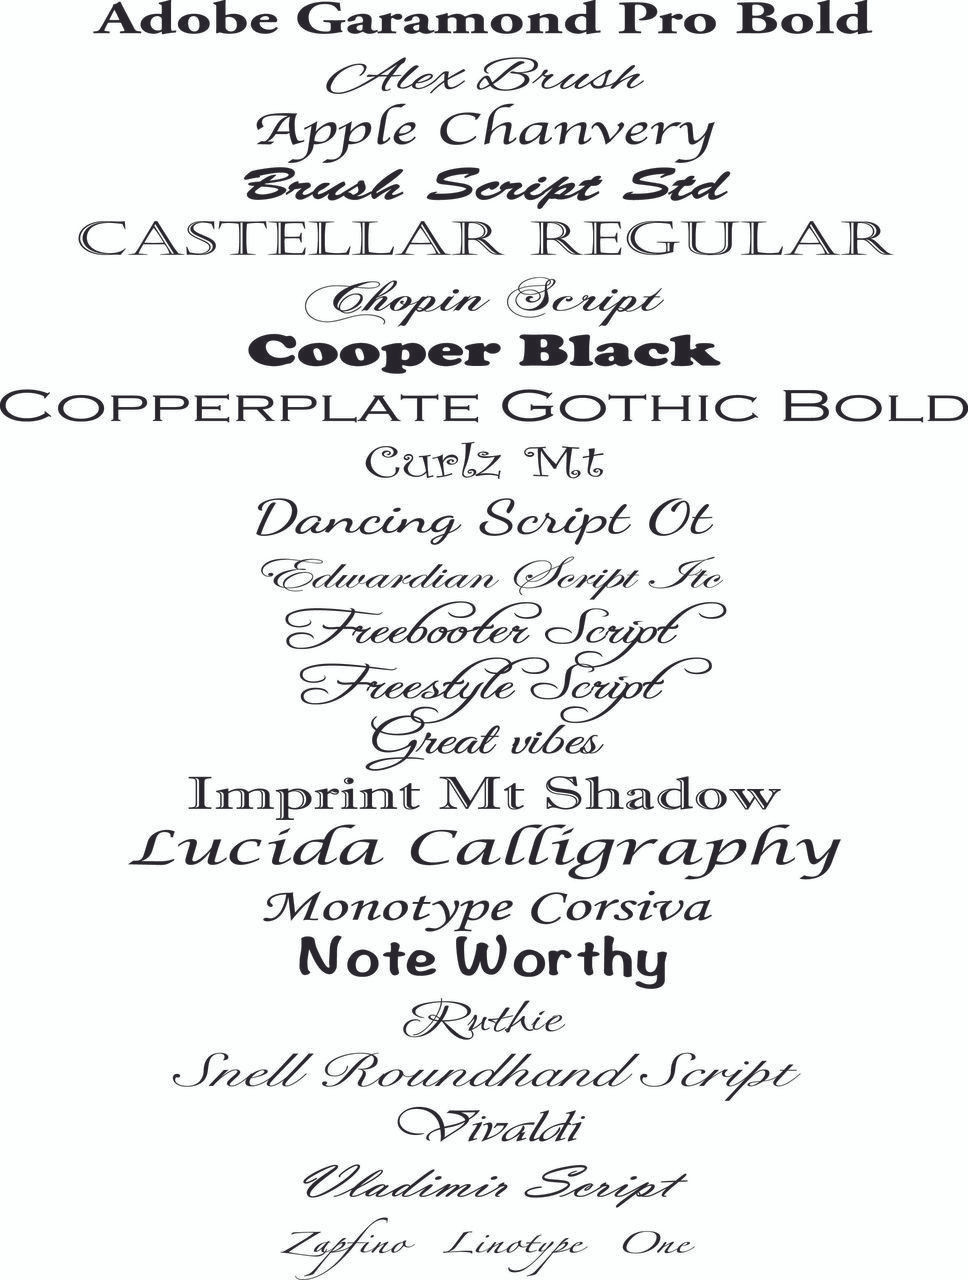 Wedding, high, quality, Font, letters,lettering, custom, marriage, bride, groom, boda, wed, text, list, popular, led, foam Stick,